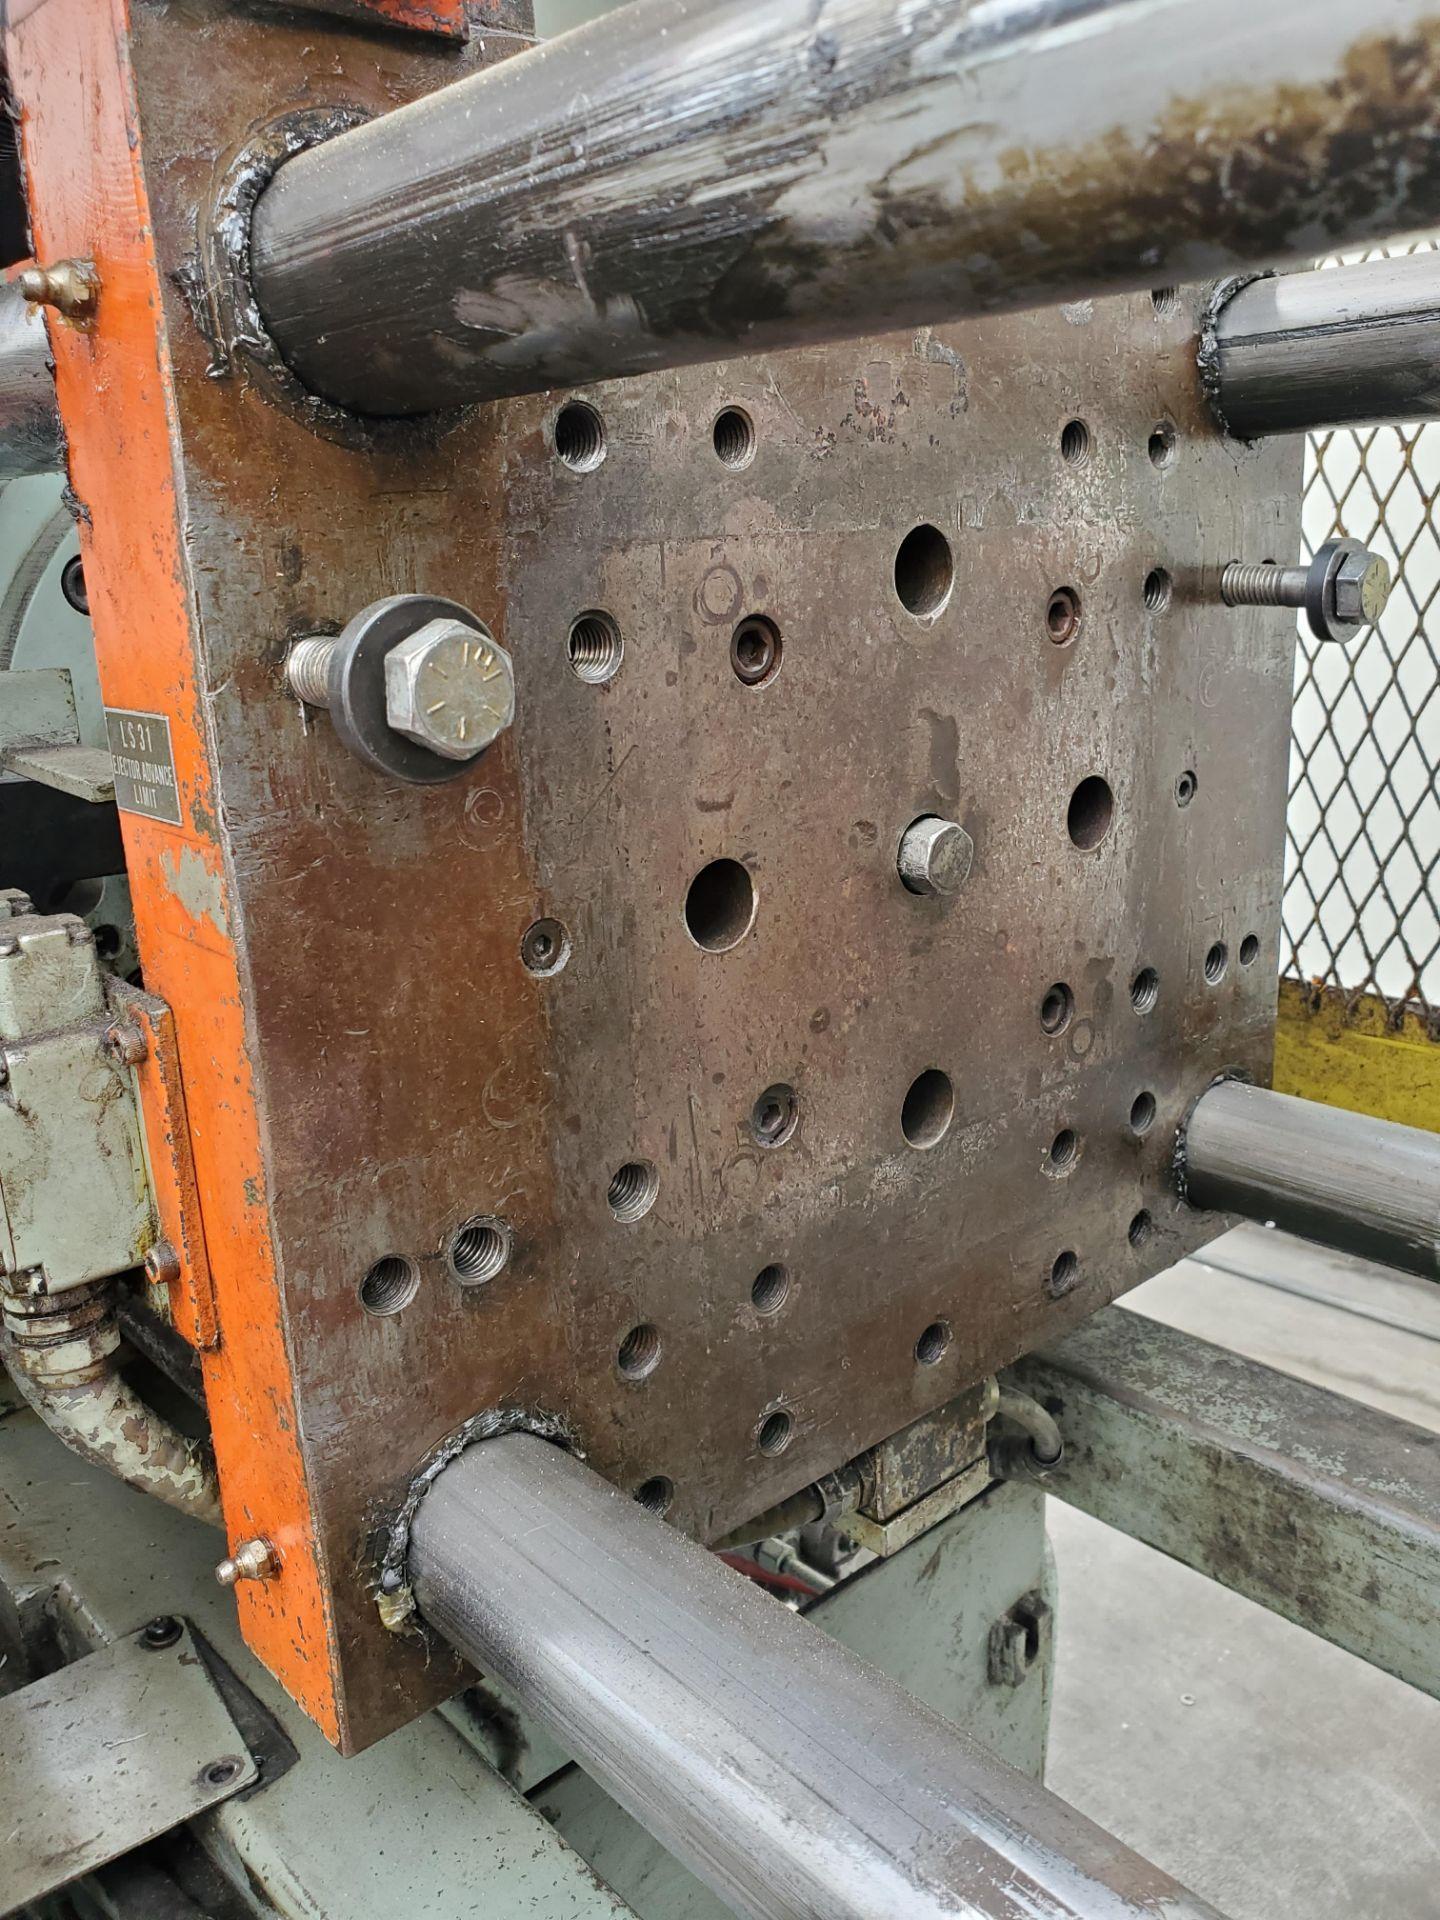 TOSHIBA ISS-85 INJECTION MOLDING MACHINE - Image 4 of 4